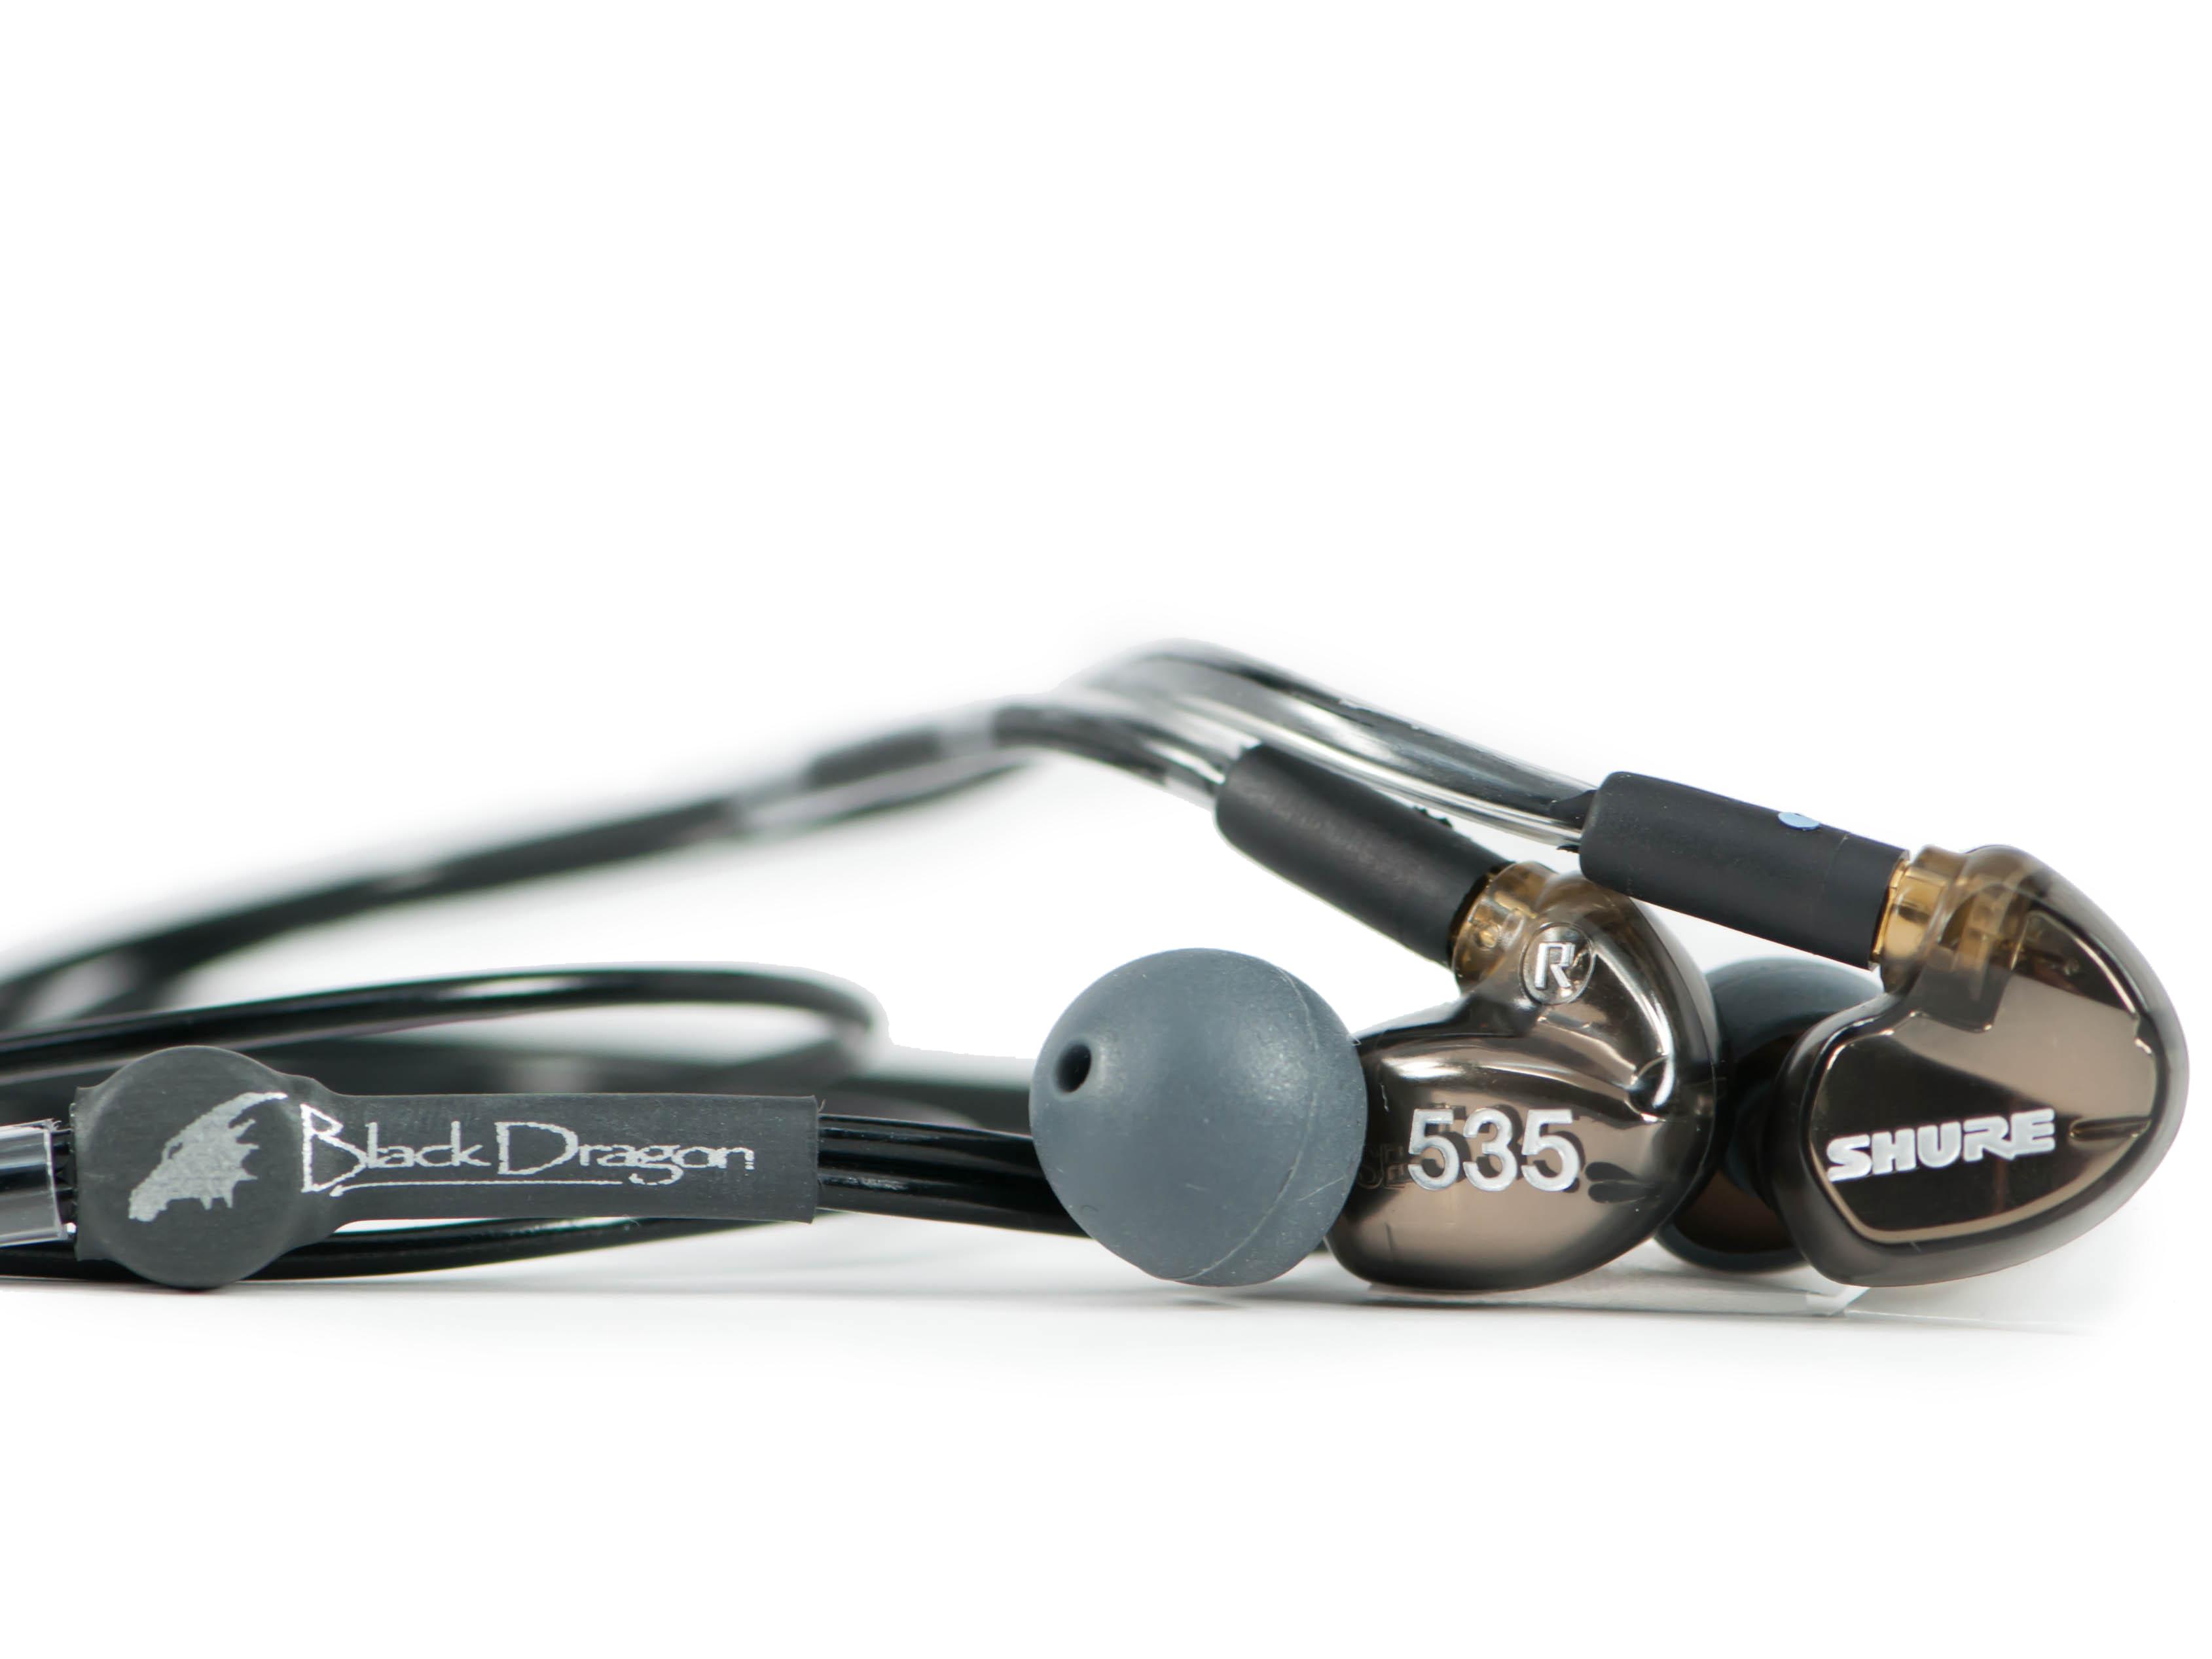 Shure SE535 Earphones + Black Dragon IEM